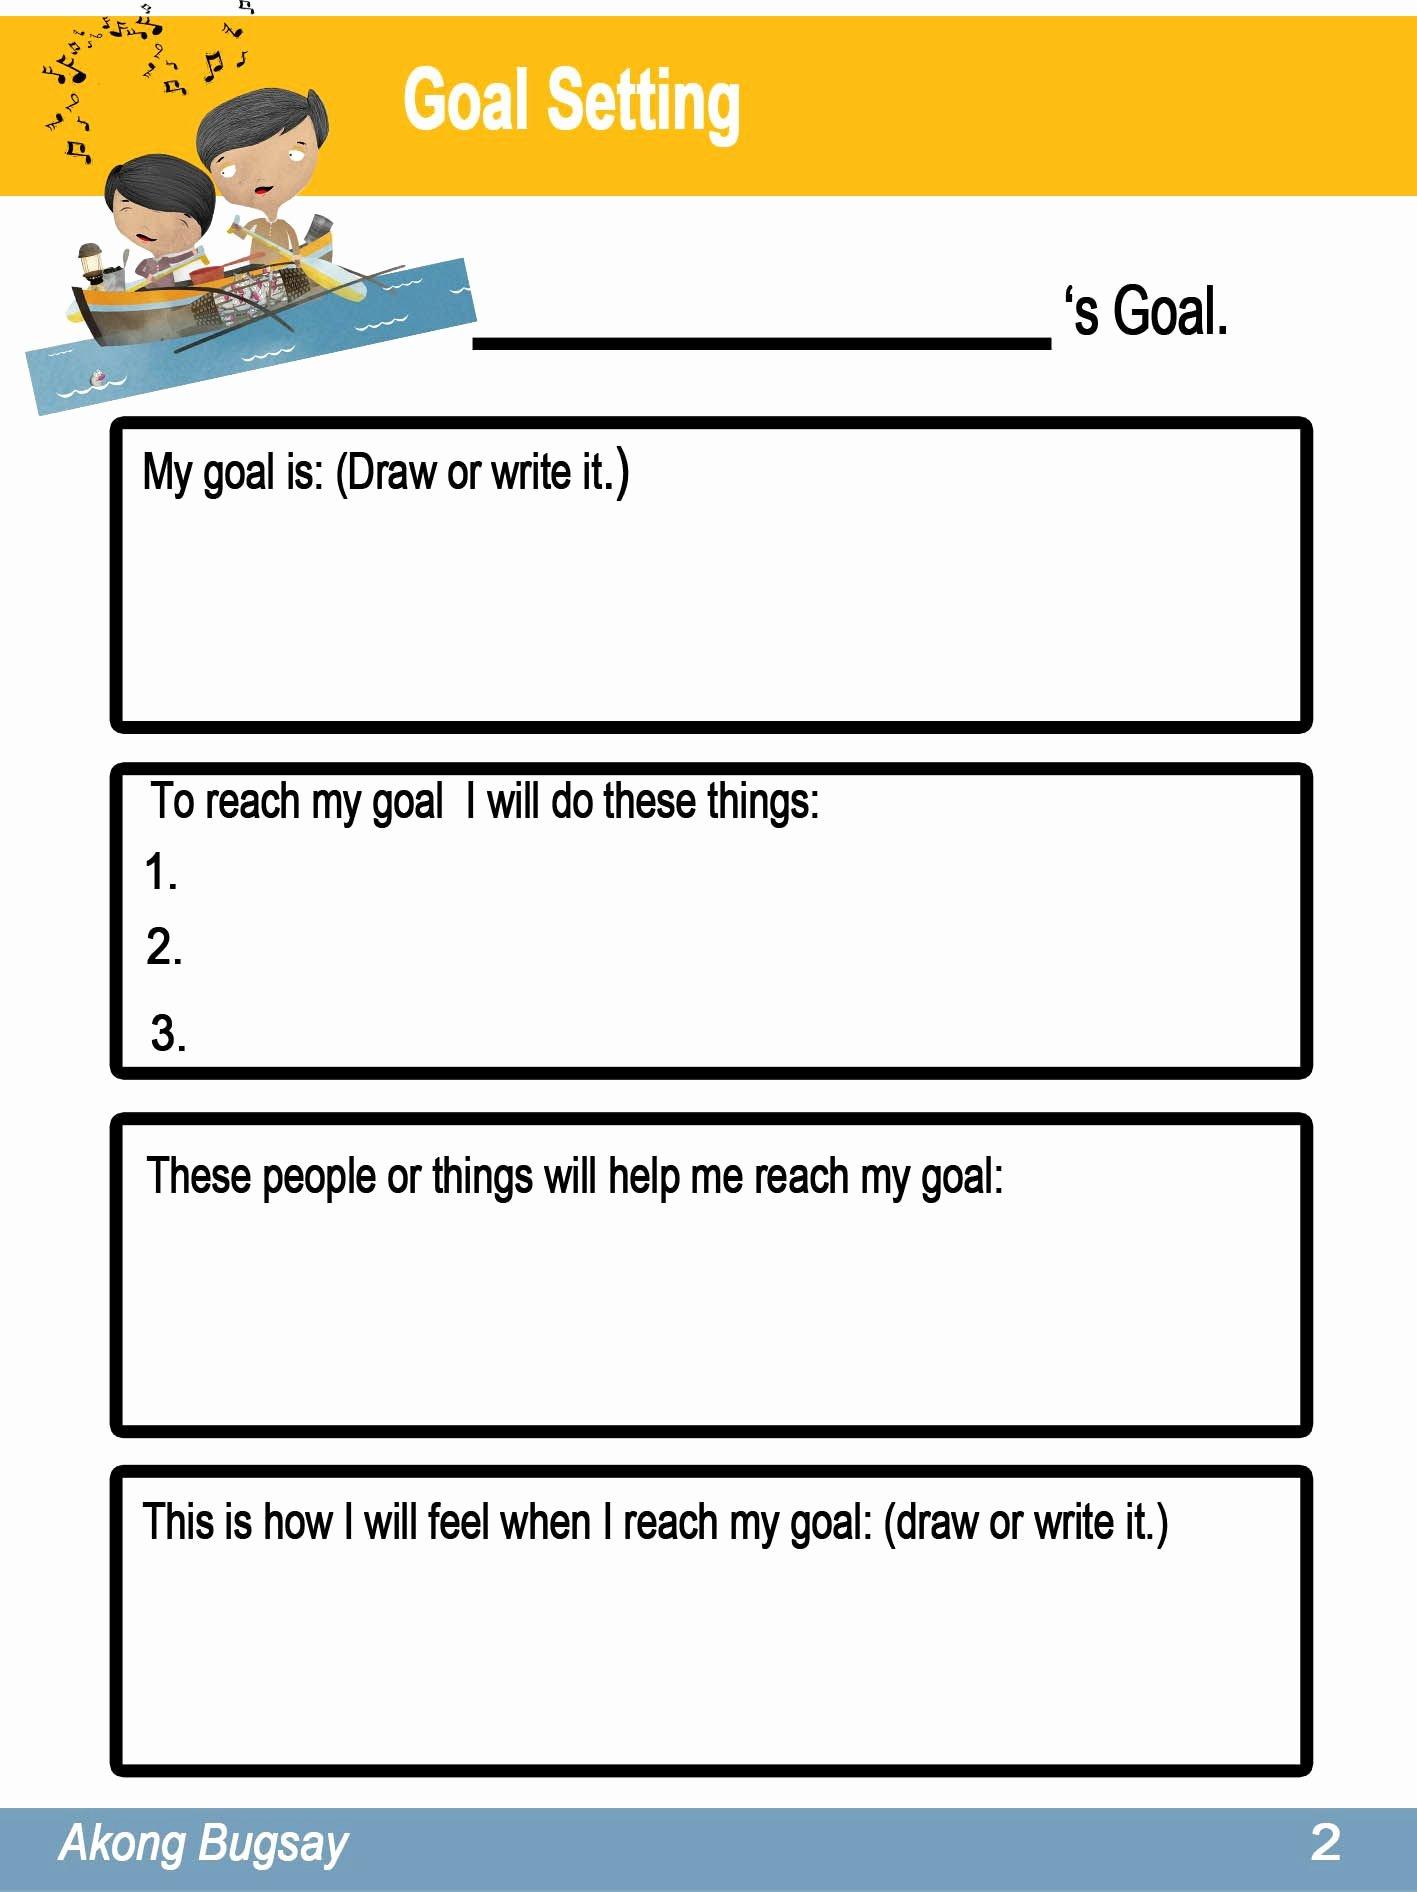 Goal Setting Template New Goalsetting Copy 1 417×1 892 Pixels